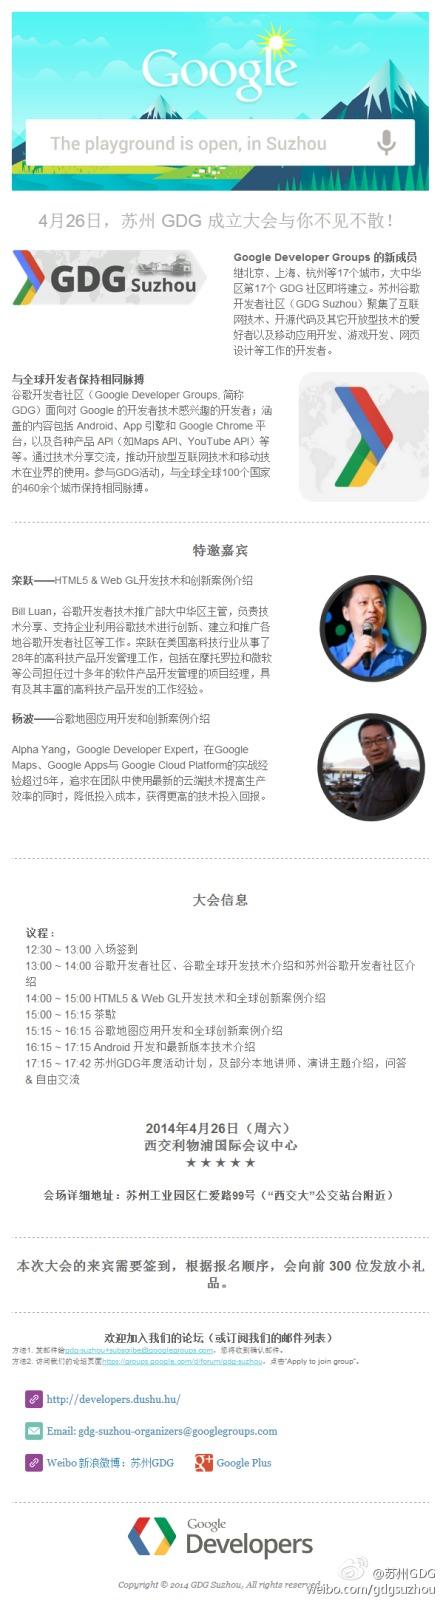 4.26 weibo google gdg